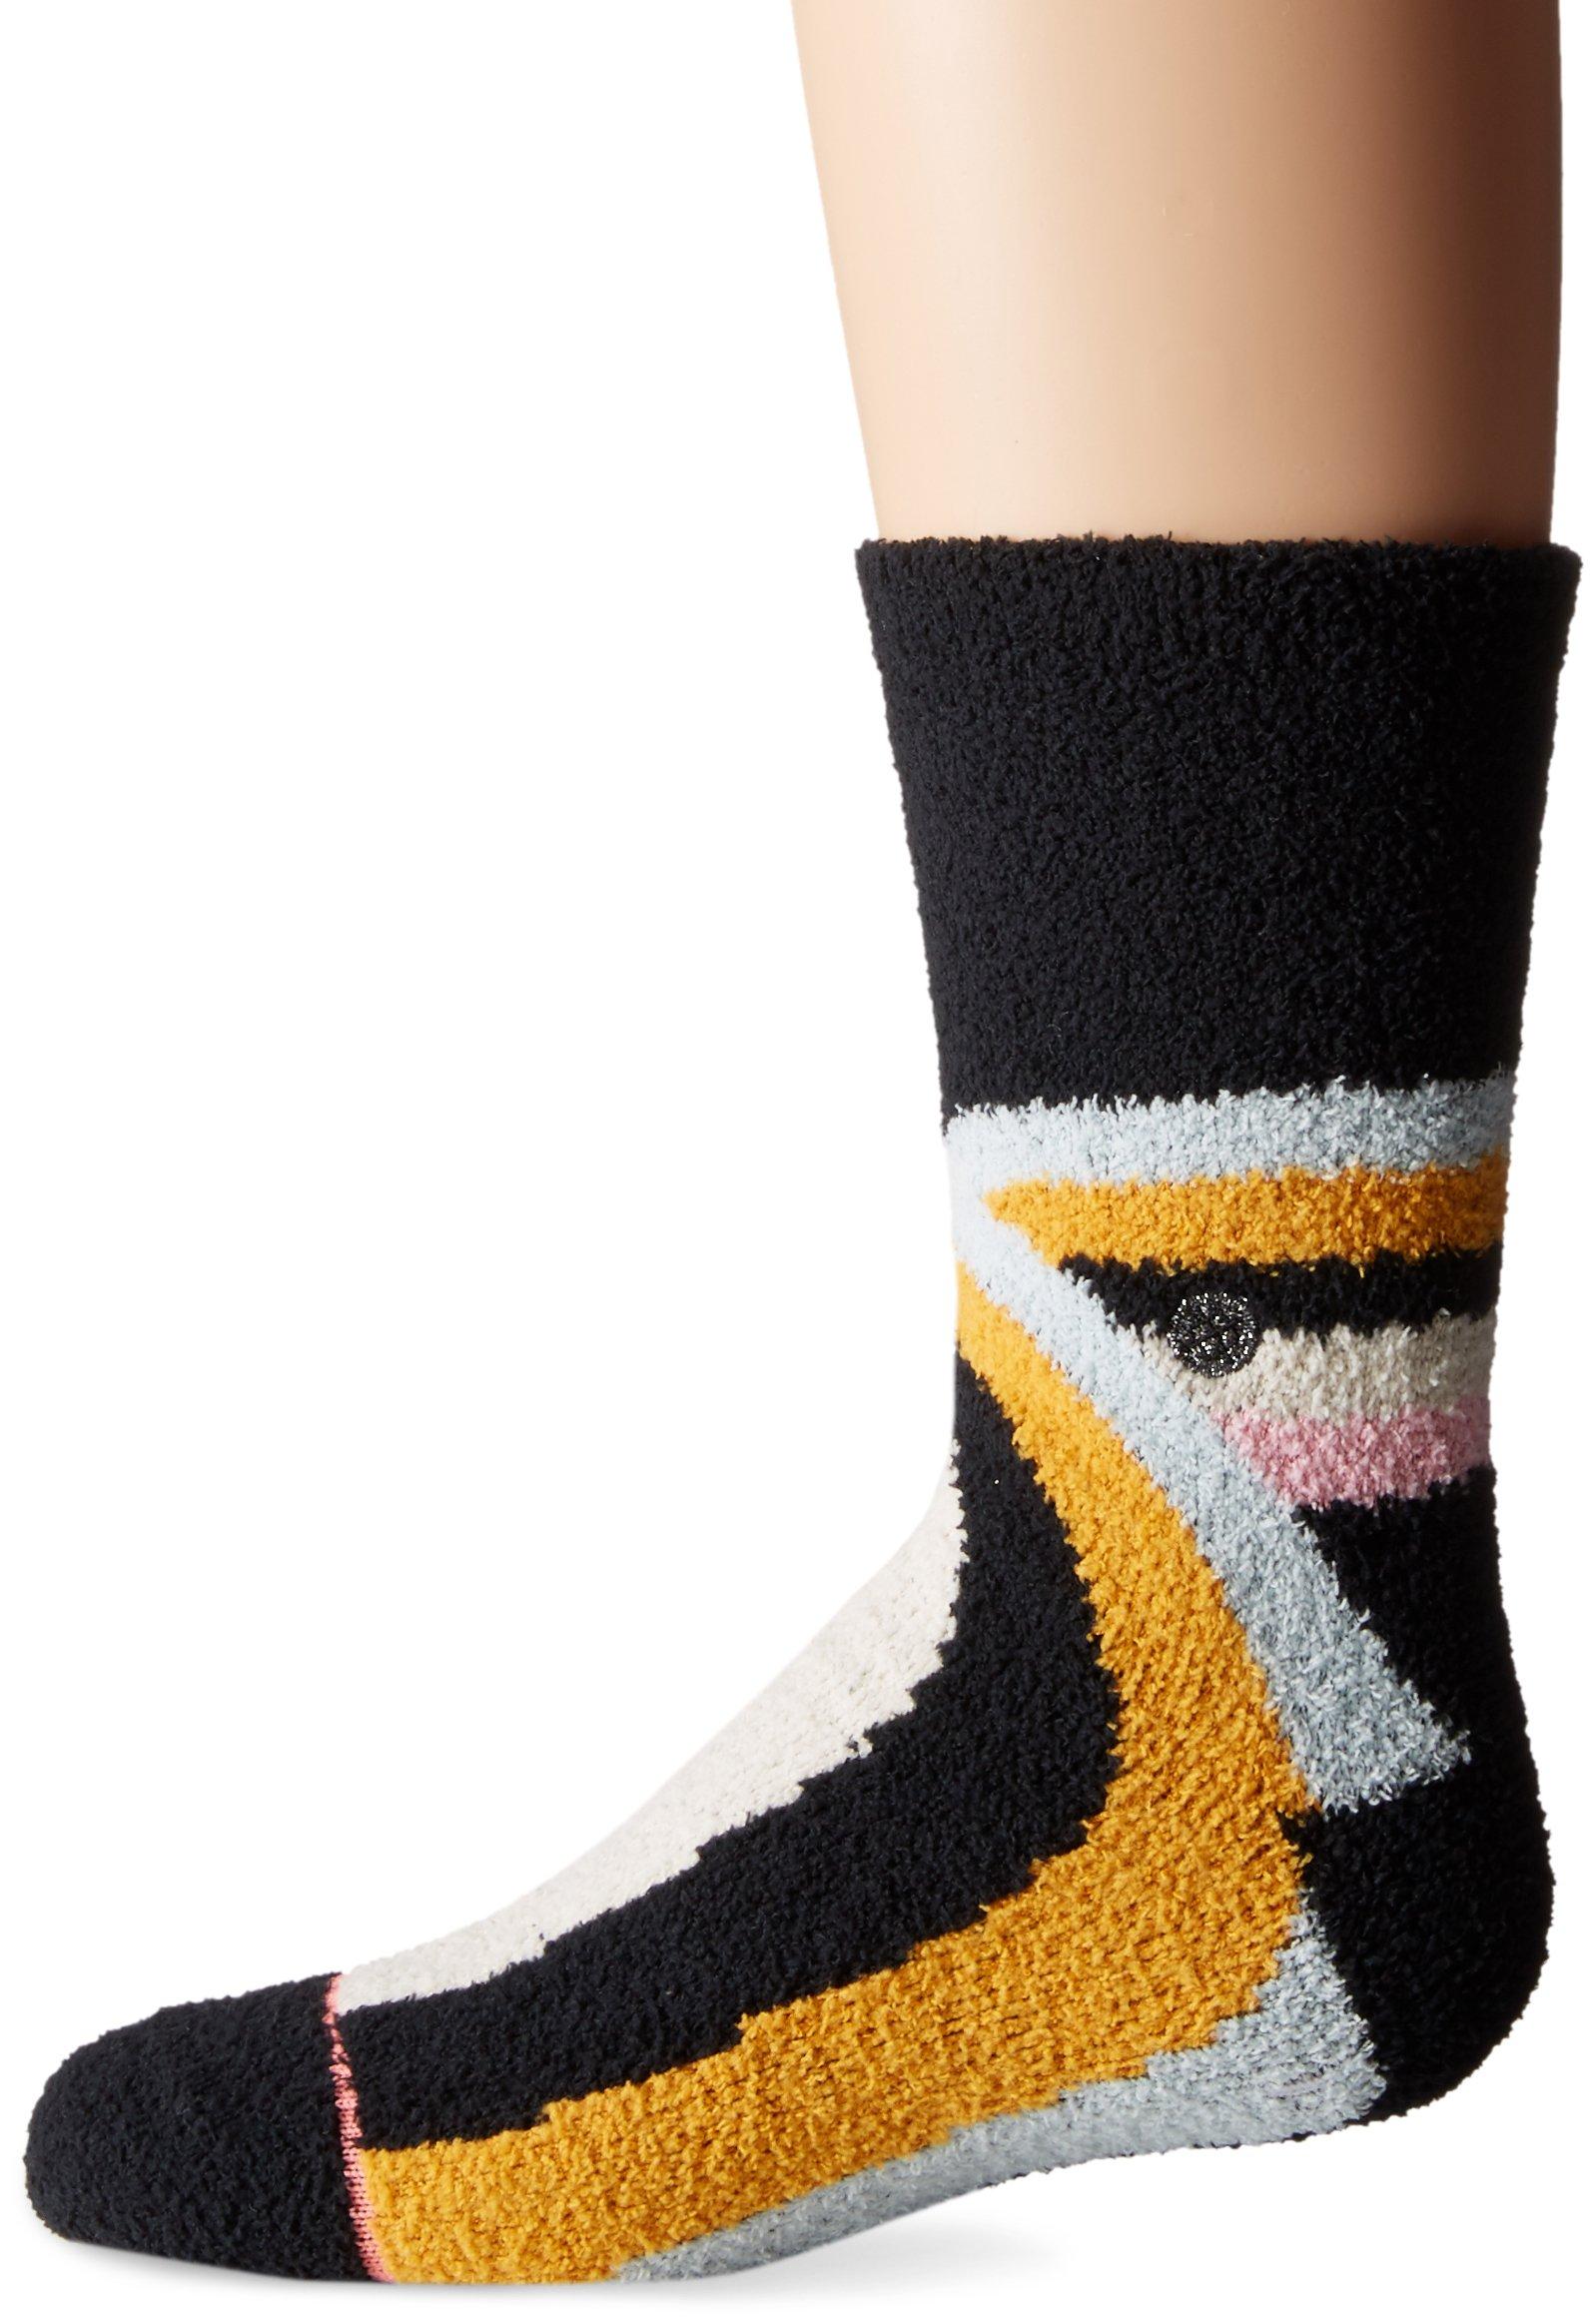 Stance Little Girls' Alana Stripes Reinforced Toe Arch Support Crew Sock, Black, L